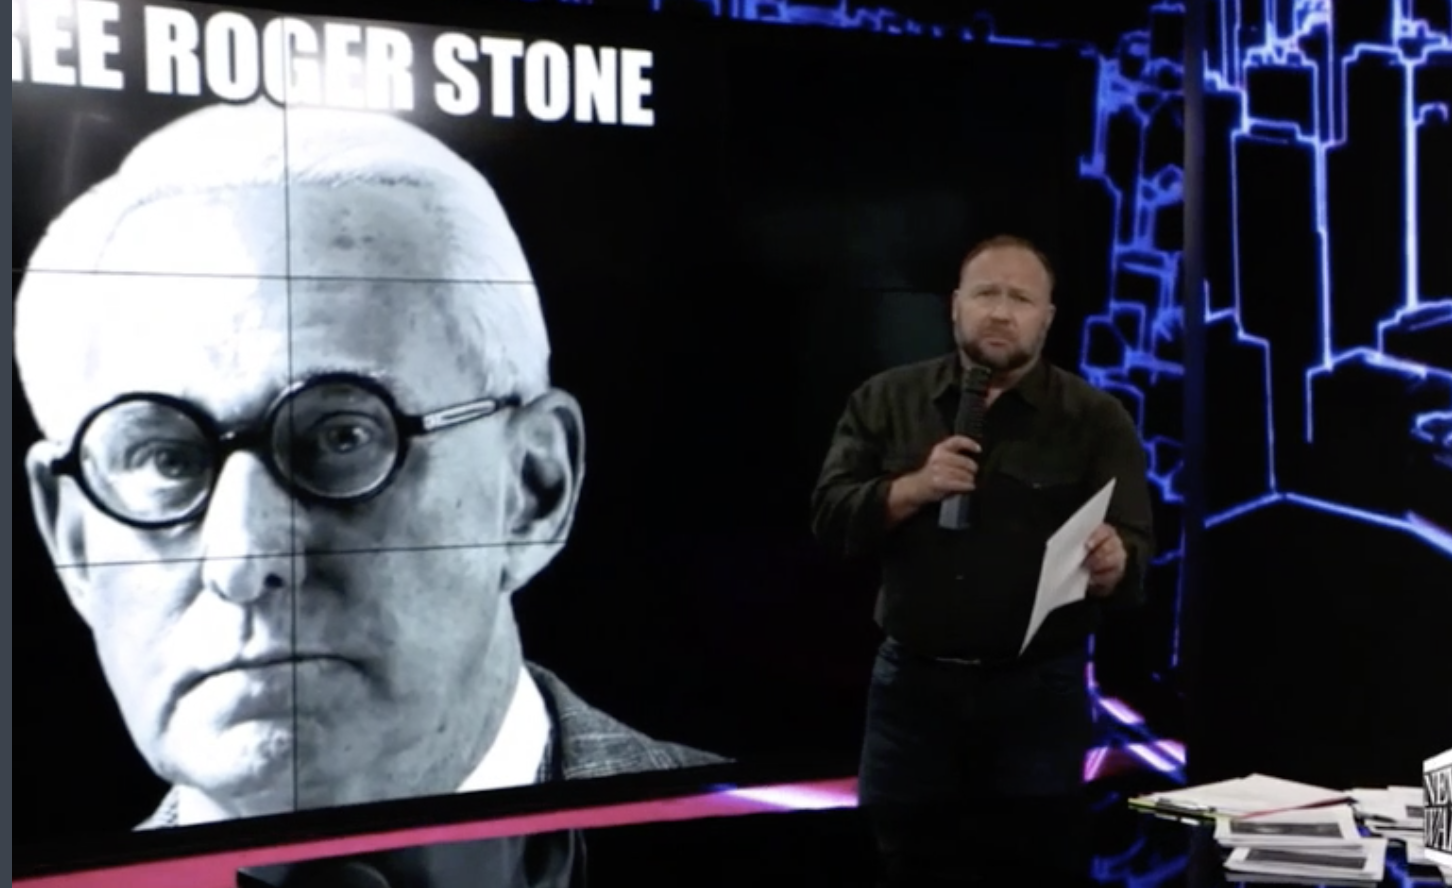 As Jury Deliberates, Roger Stone Sends A Message To Trump: 'Pardon Me'